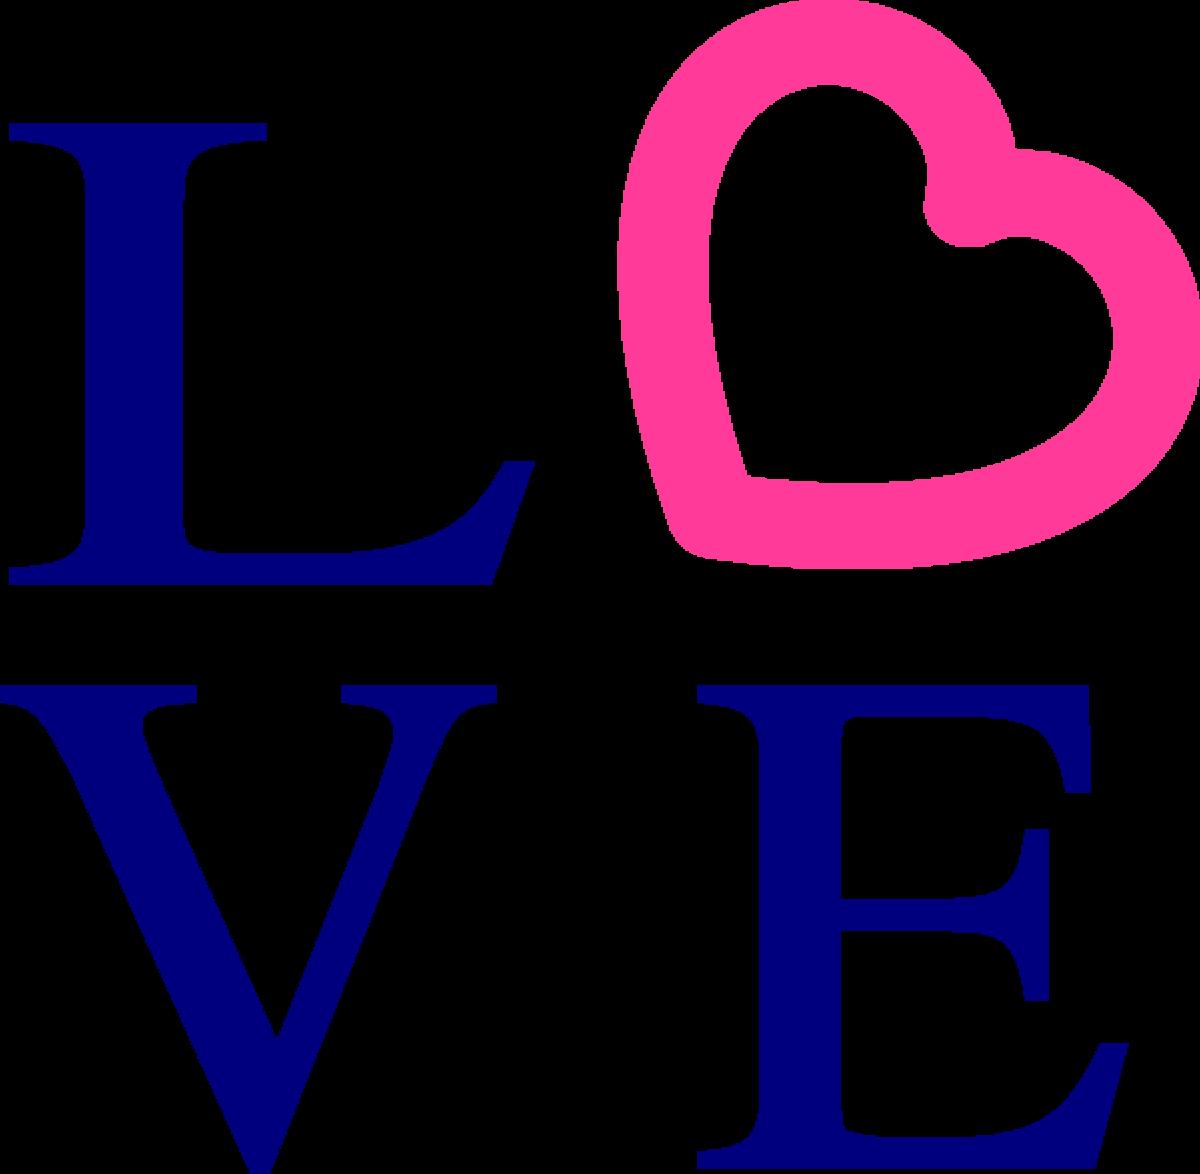 Love Heart Symbol Drawing